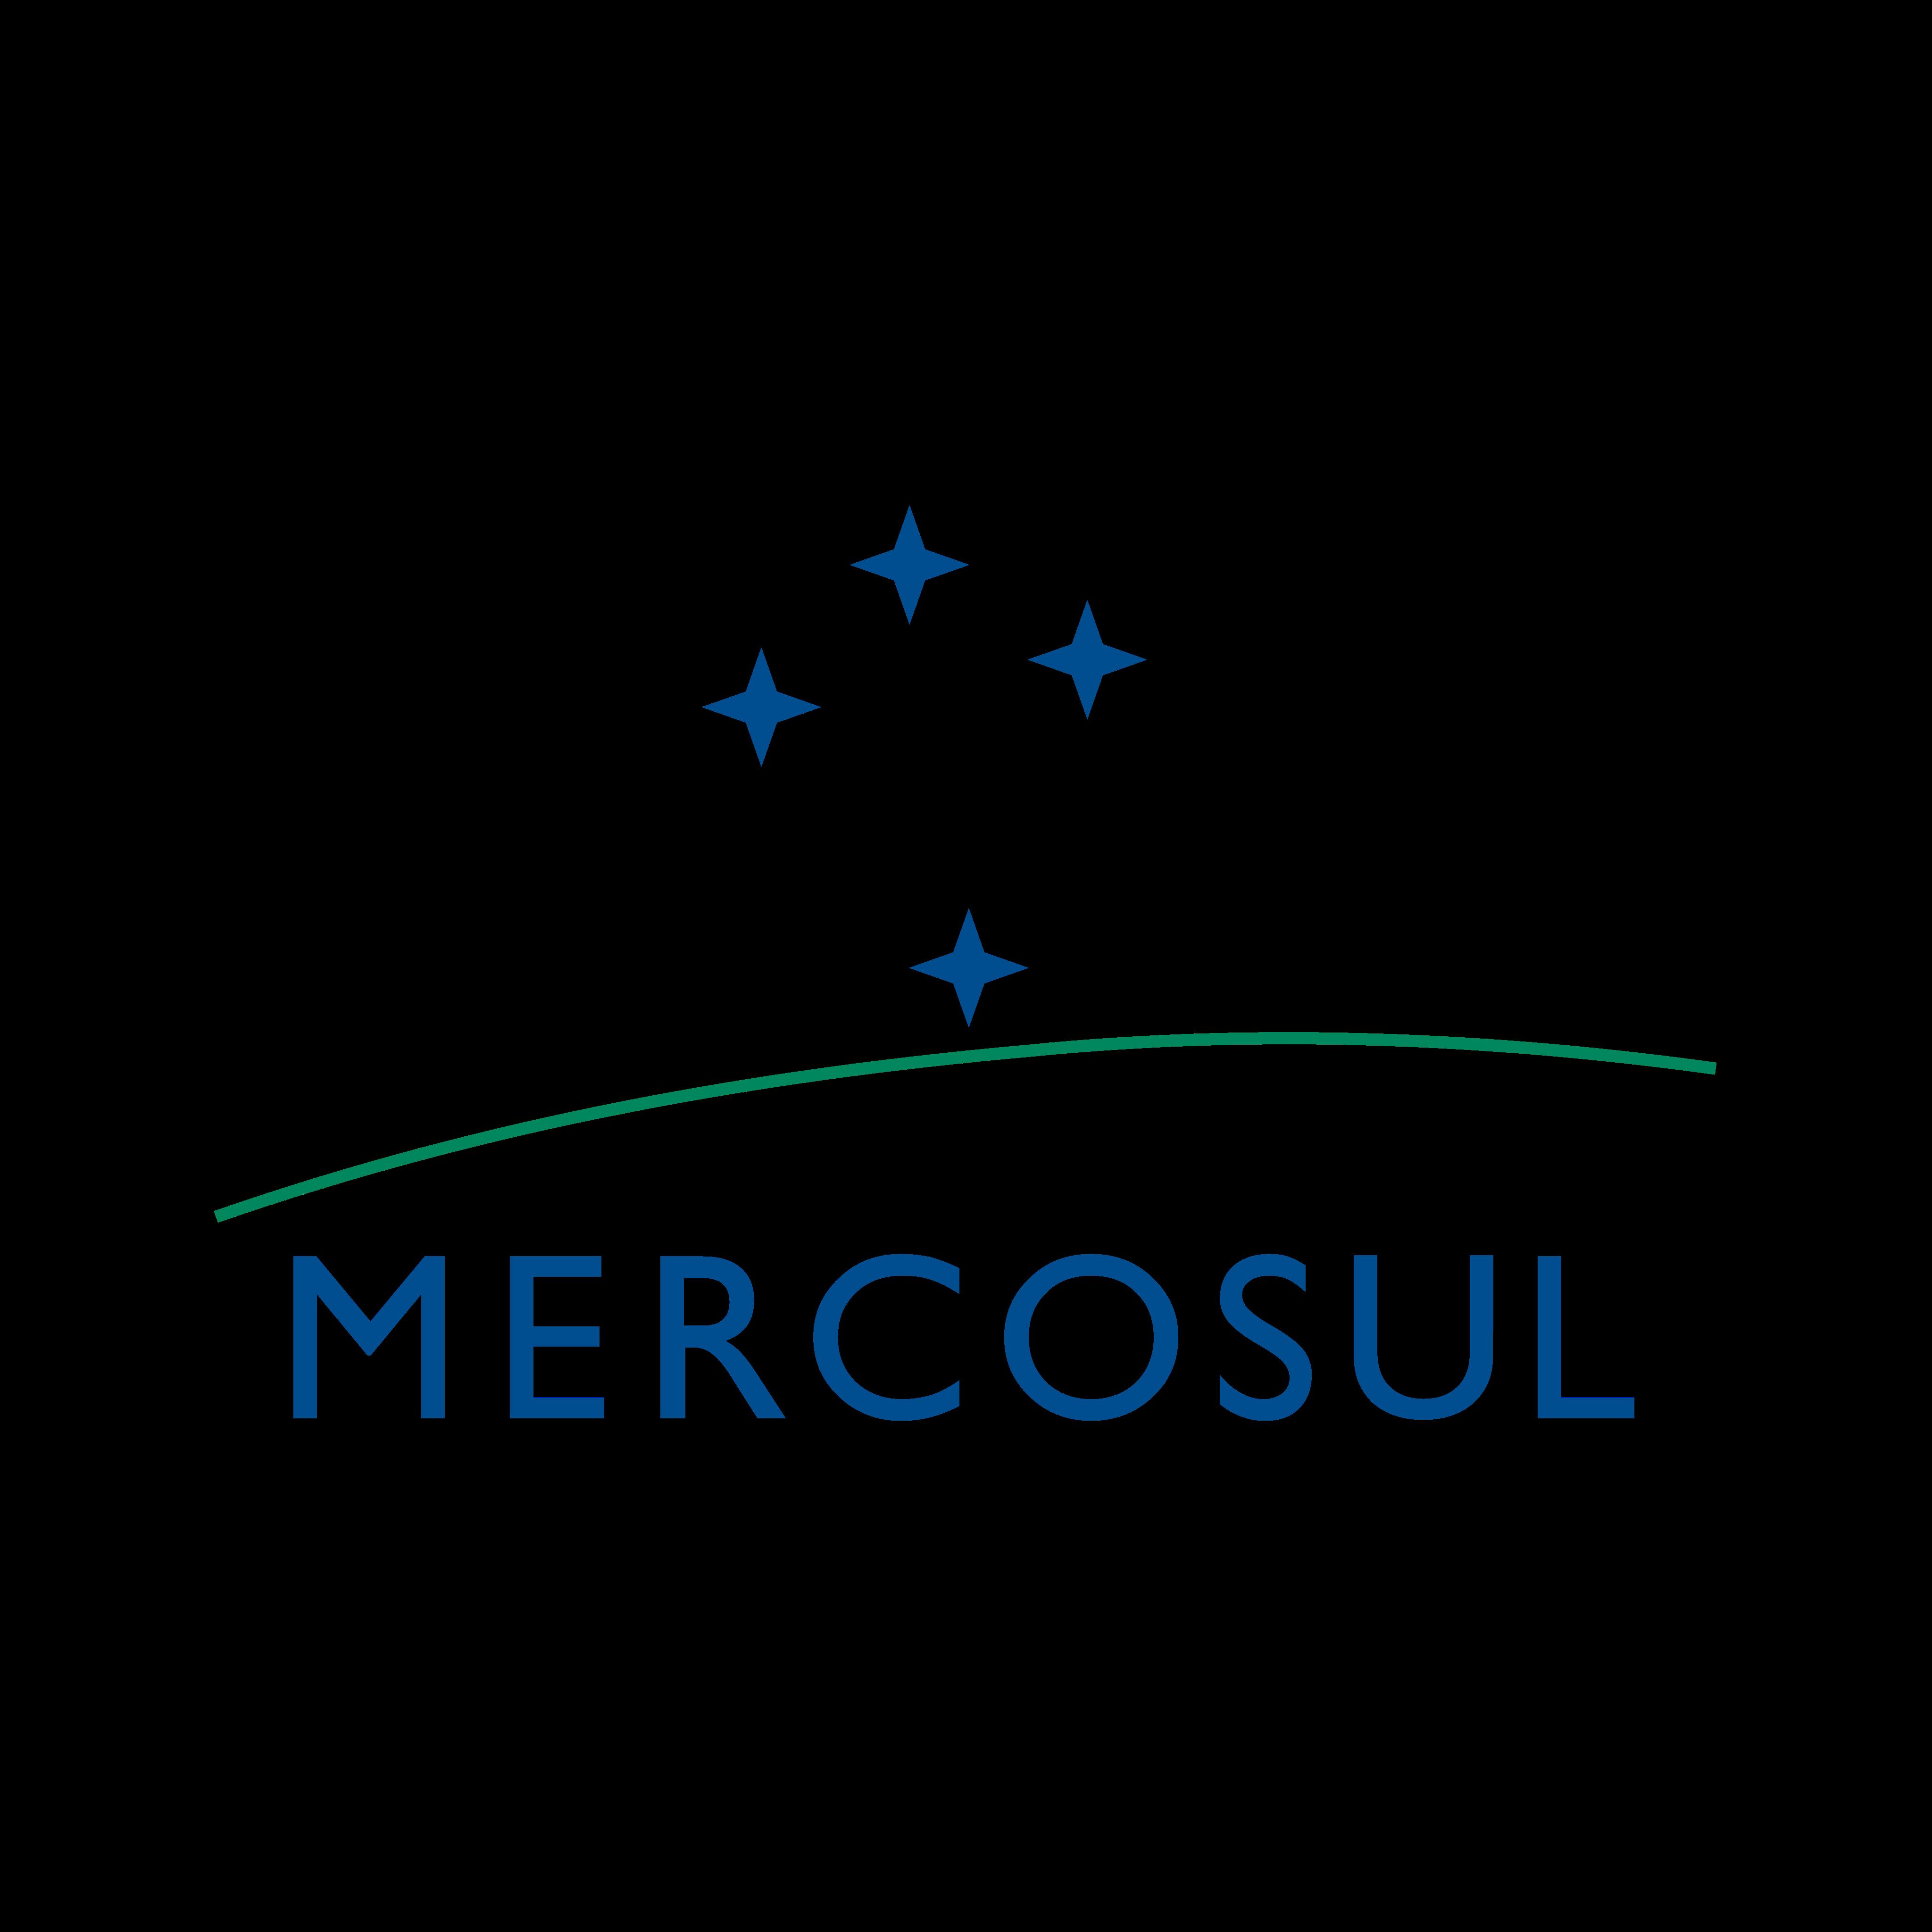 Mercosul Logo PNG.